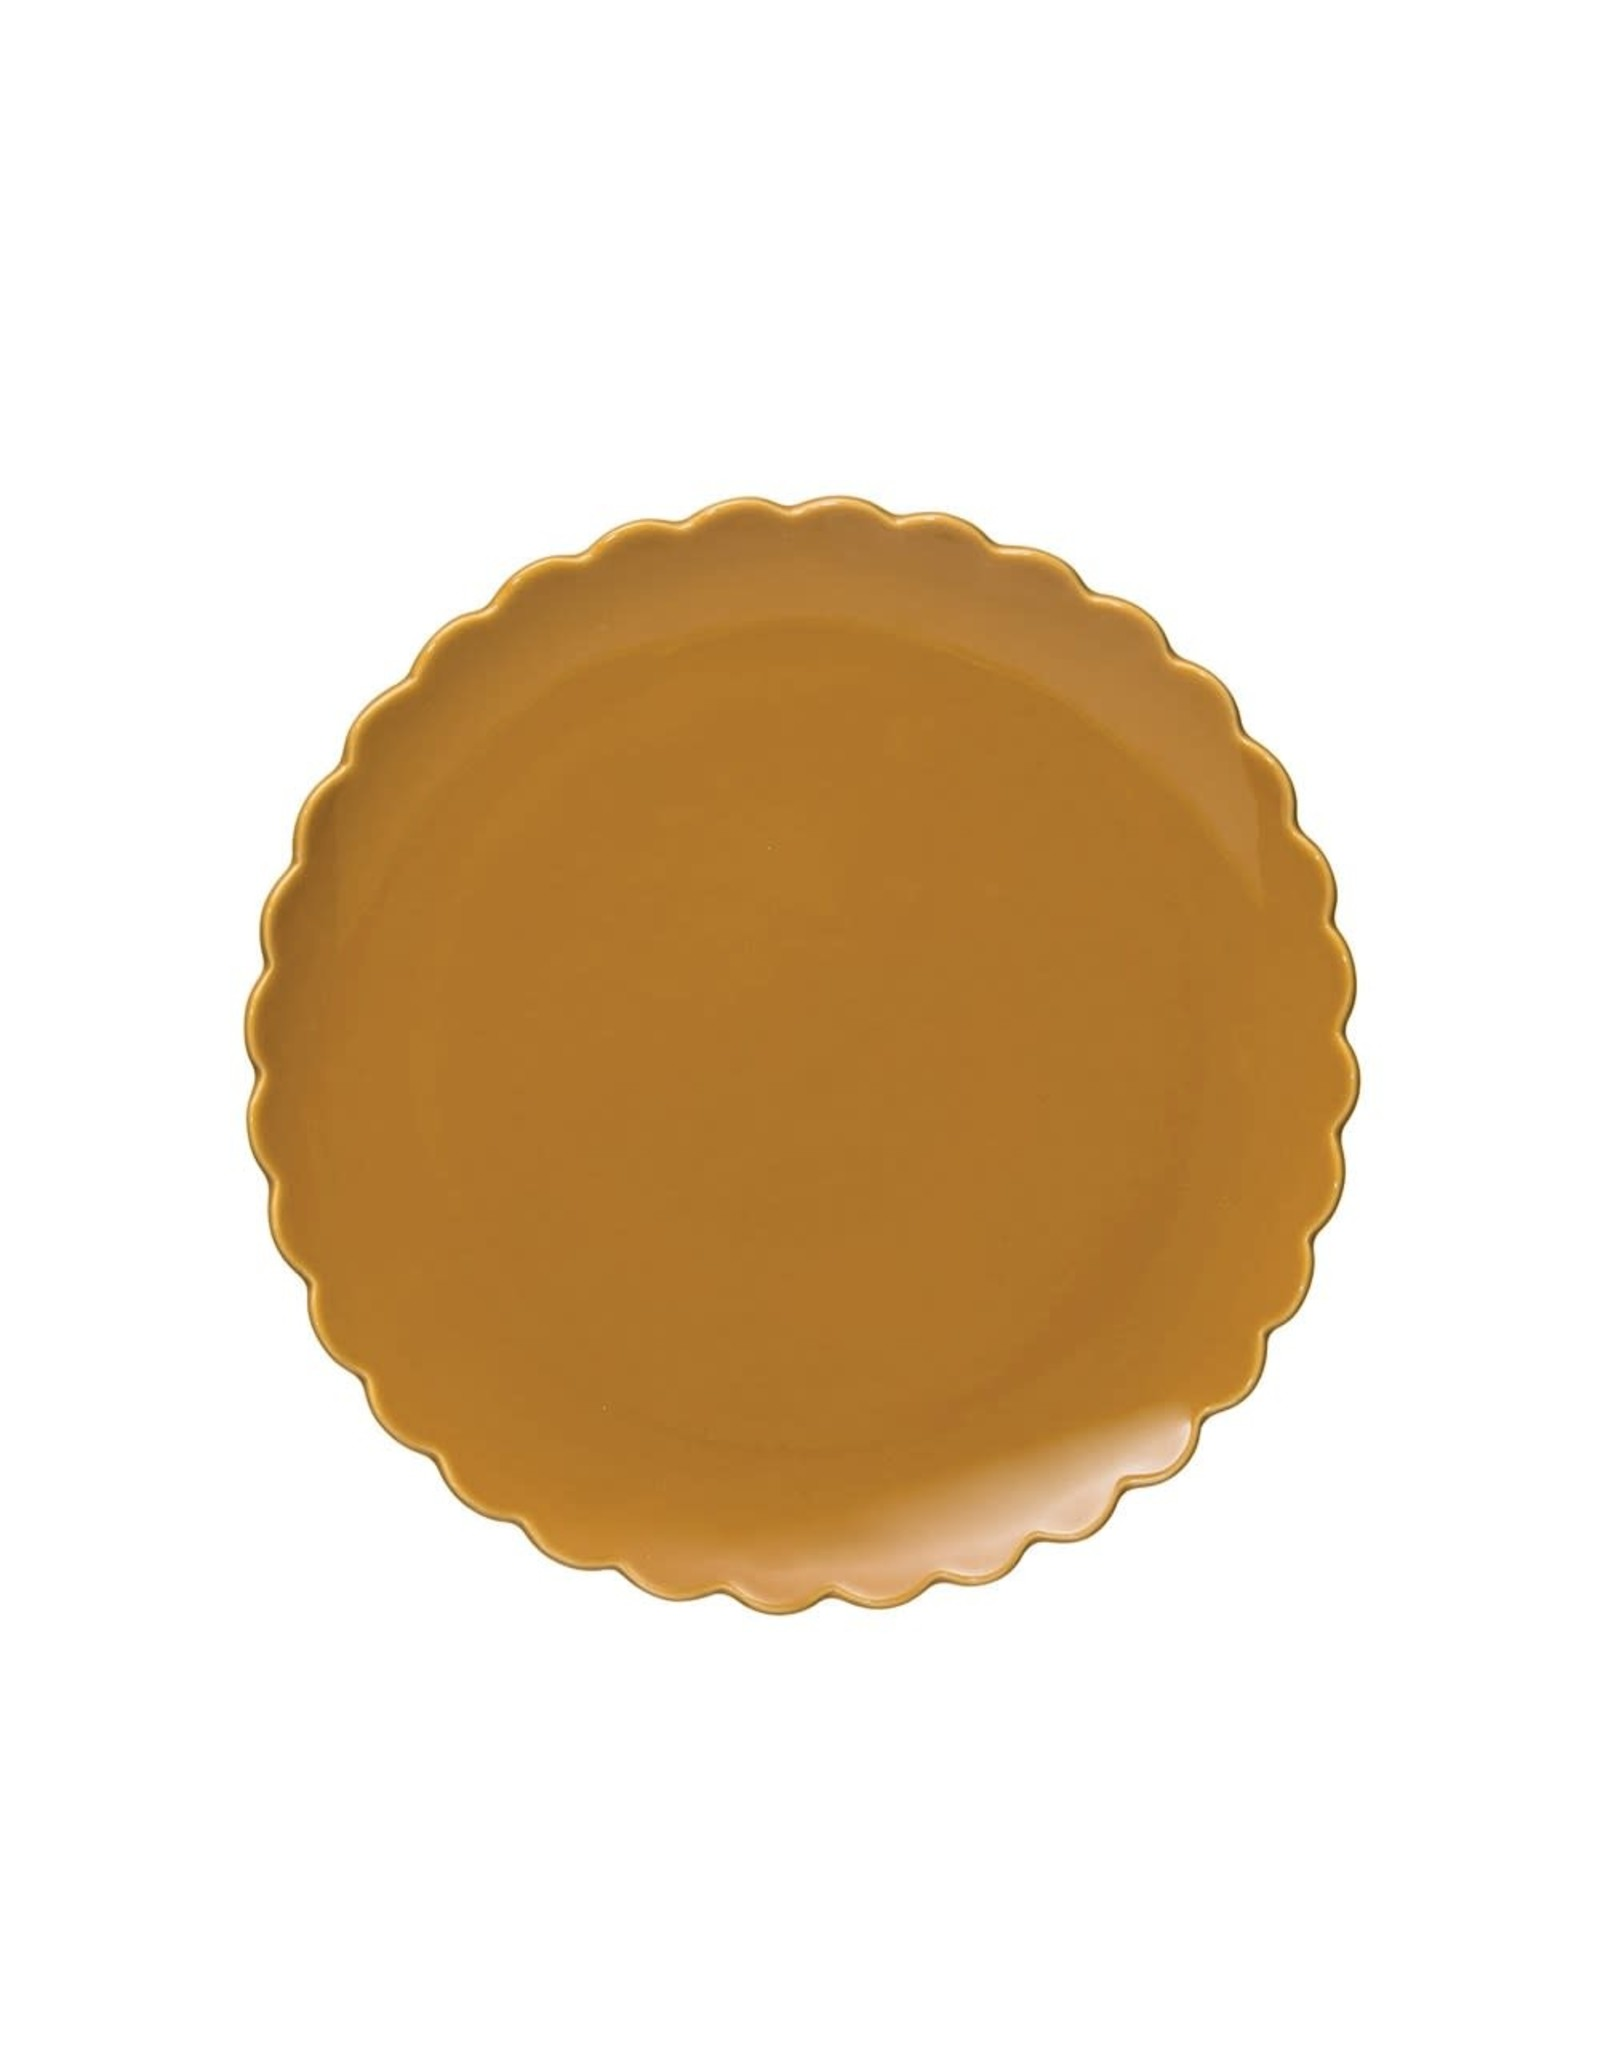 Creative Co-op Mustard Scalloped Plates